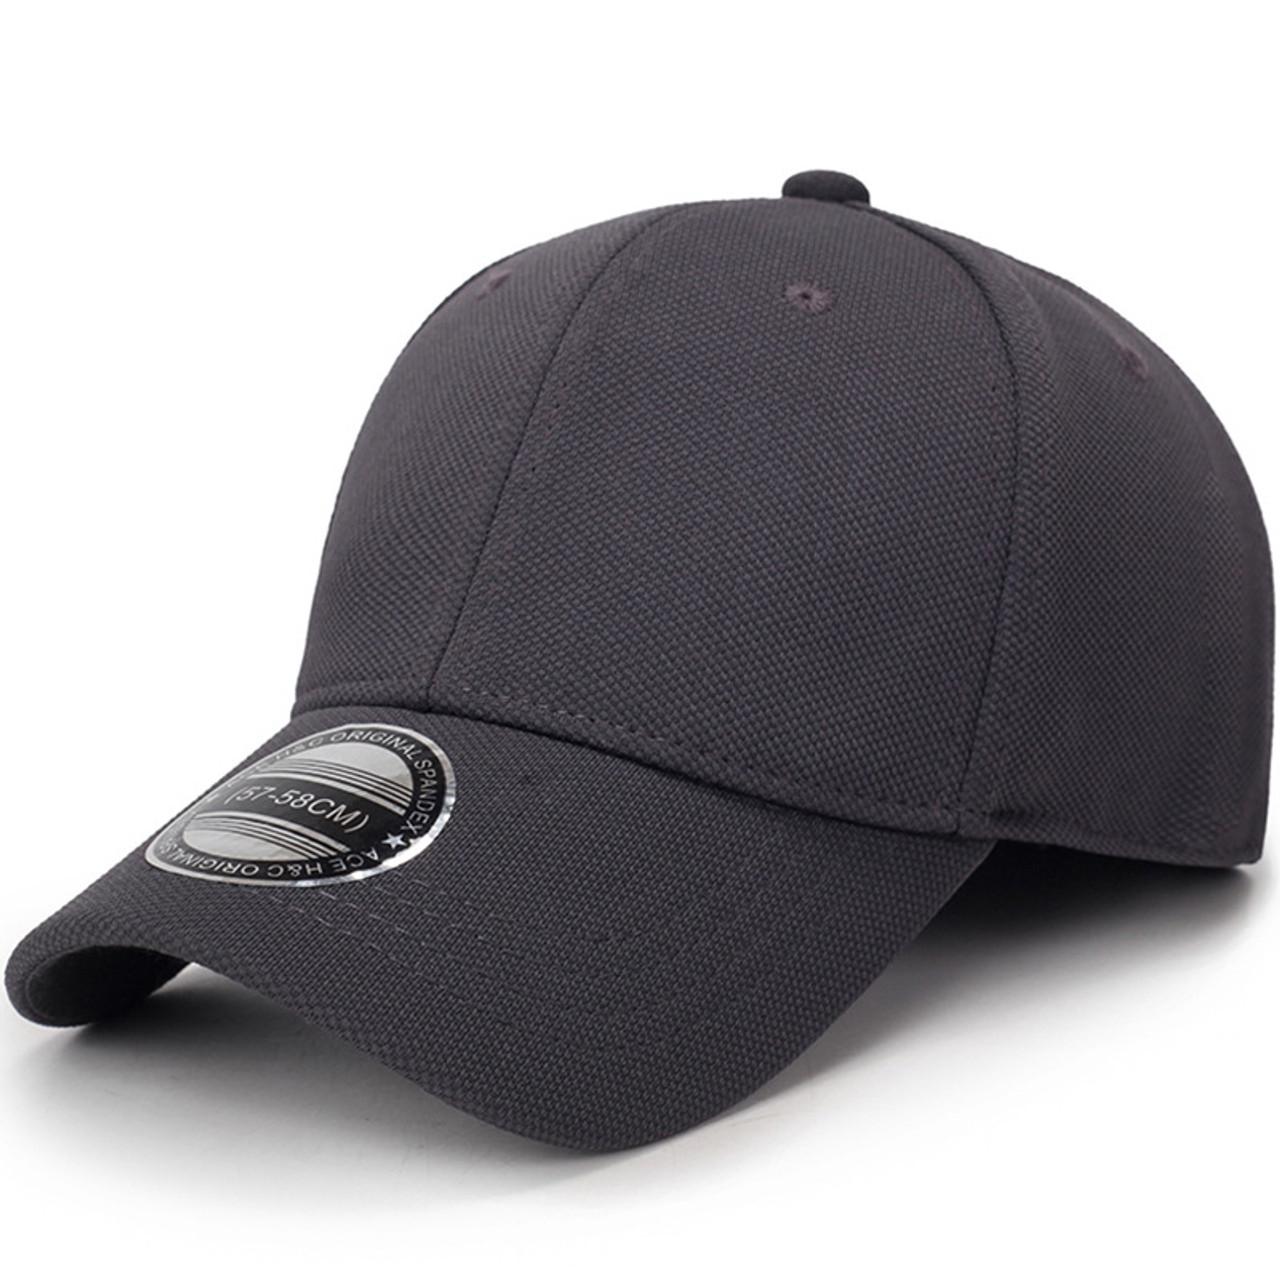 38953f18a1d2 ... High Quality Baseball Cap Men Snapback Hats Caps Men Flexfit Fitted  Closed Full Cap Women Gorras ...